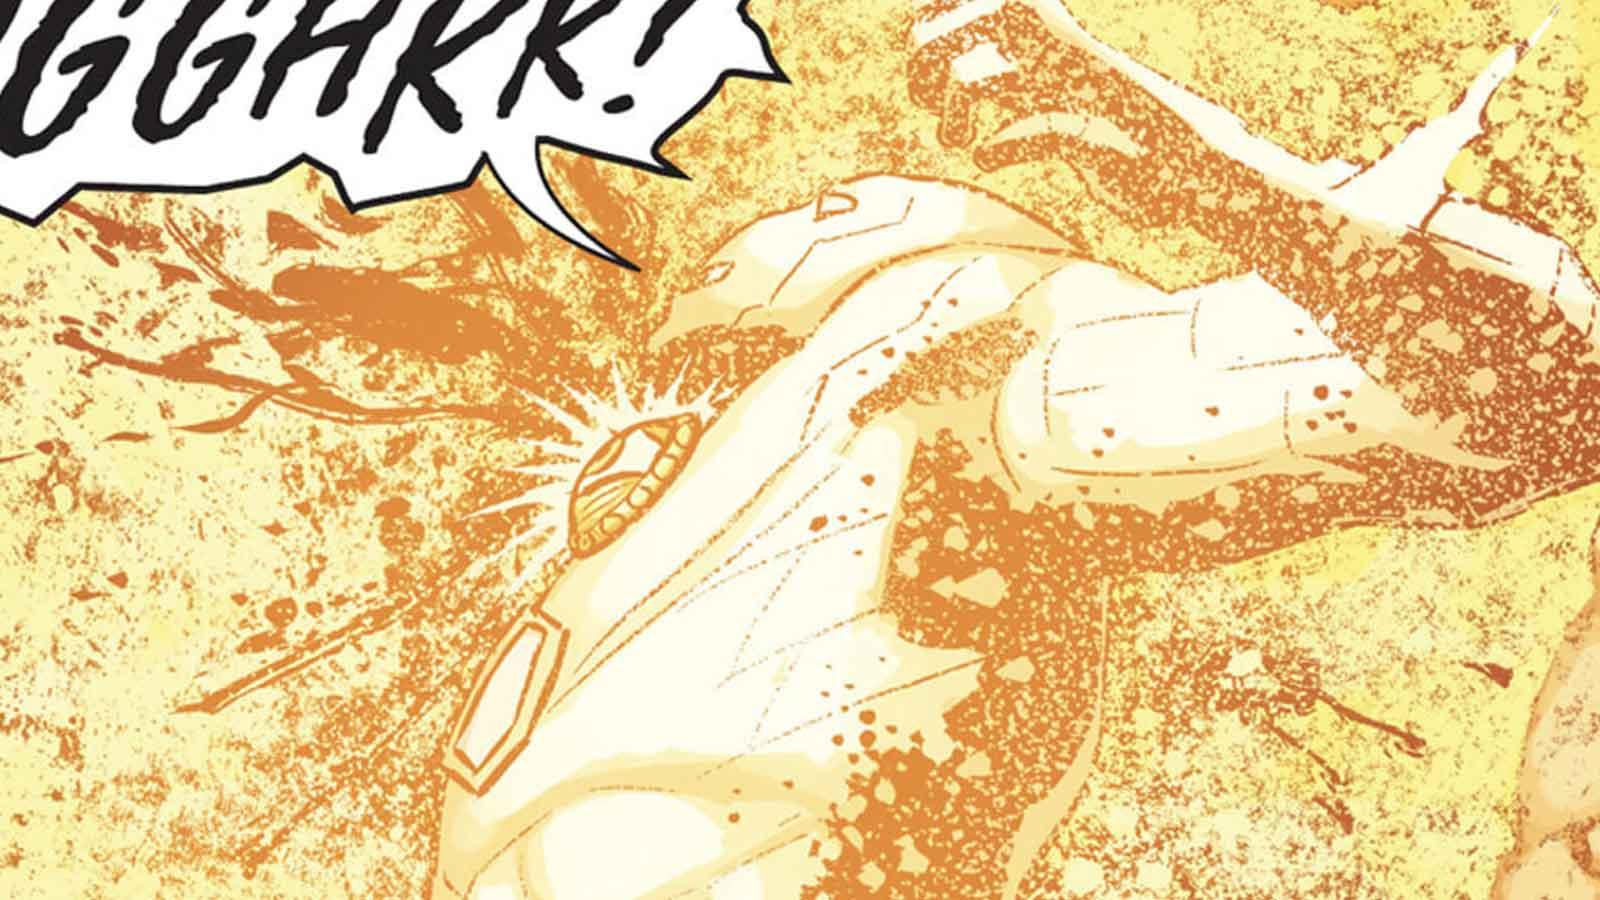 dark avengers comic de la semana